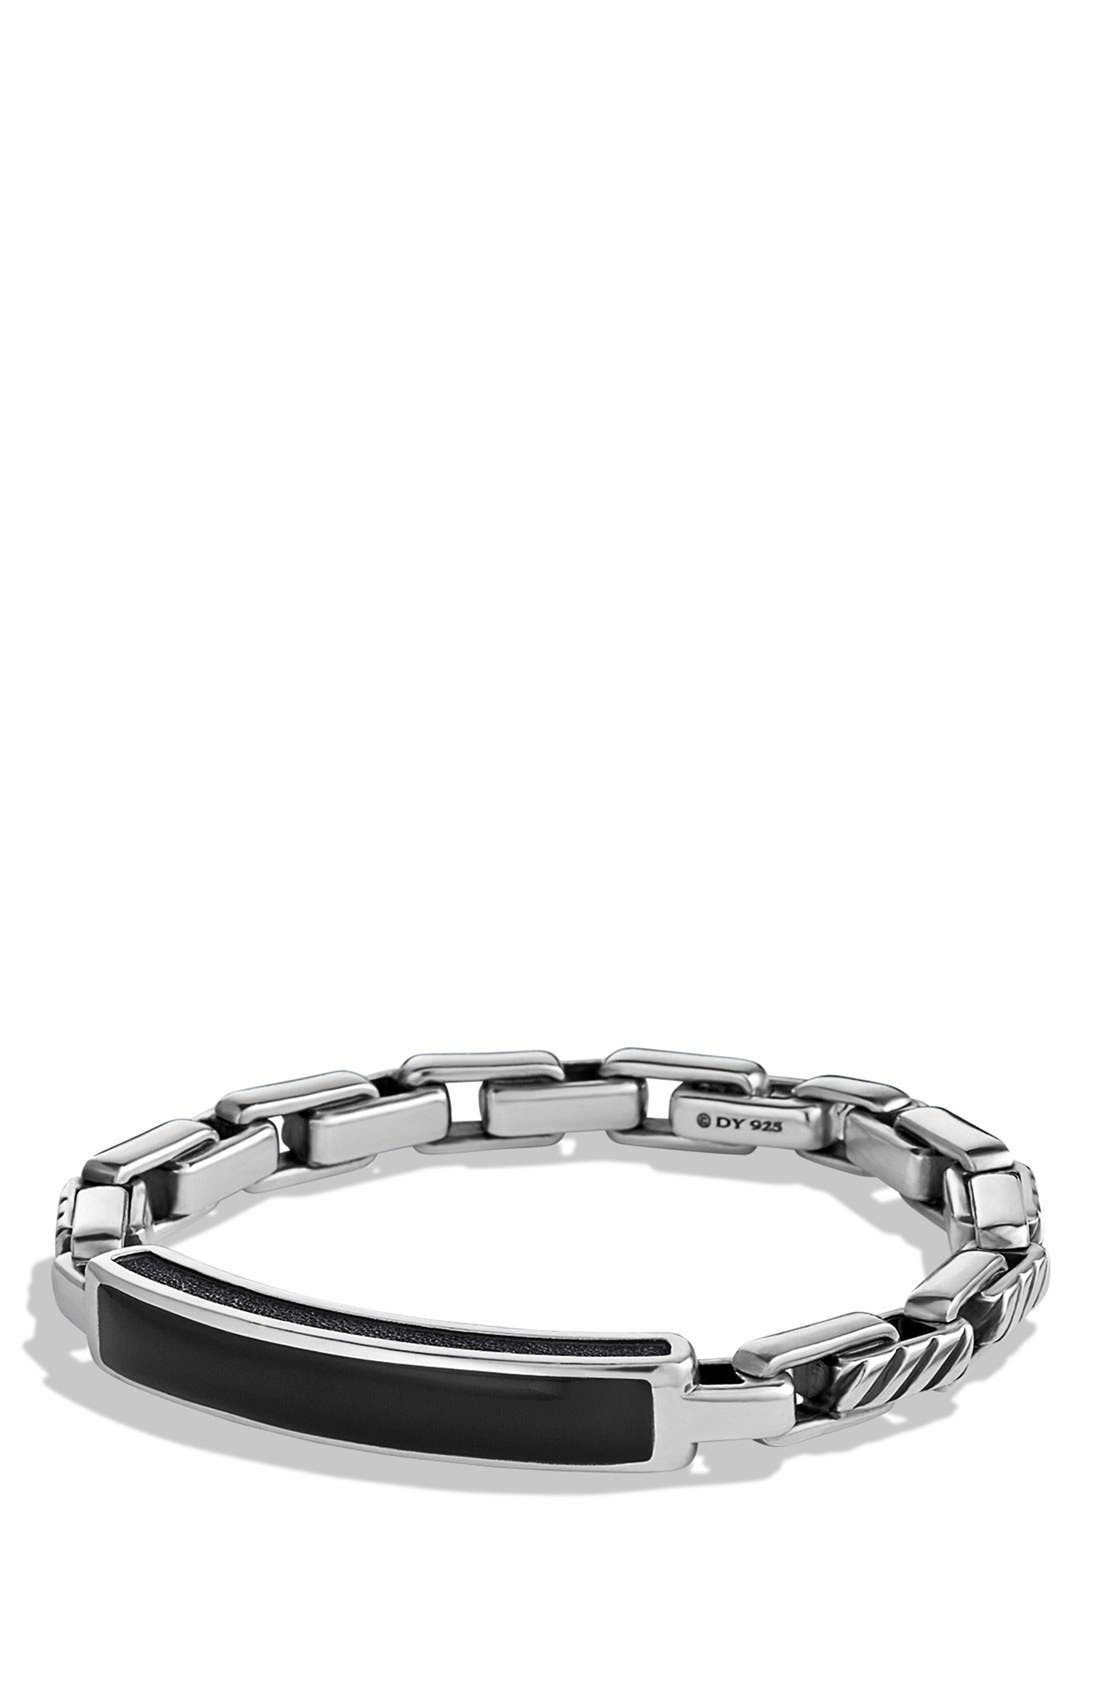 ' Modern Cable' ID Bracelet,                         Main,                         color, 001